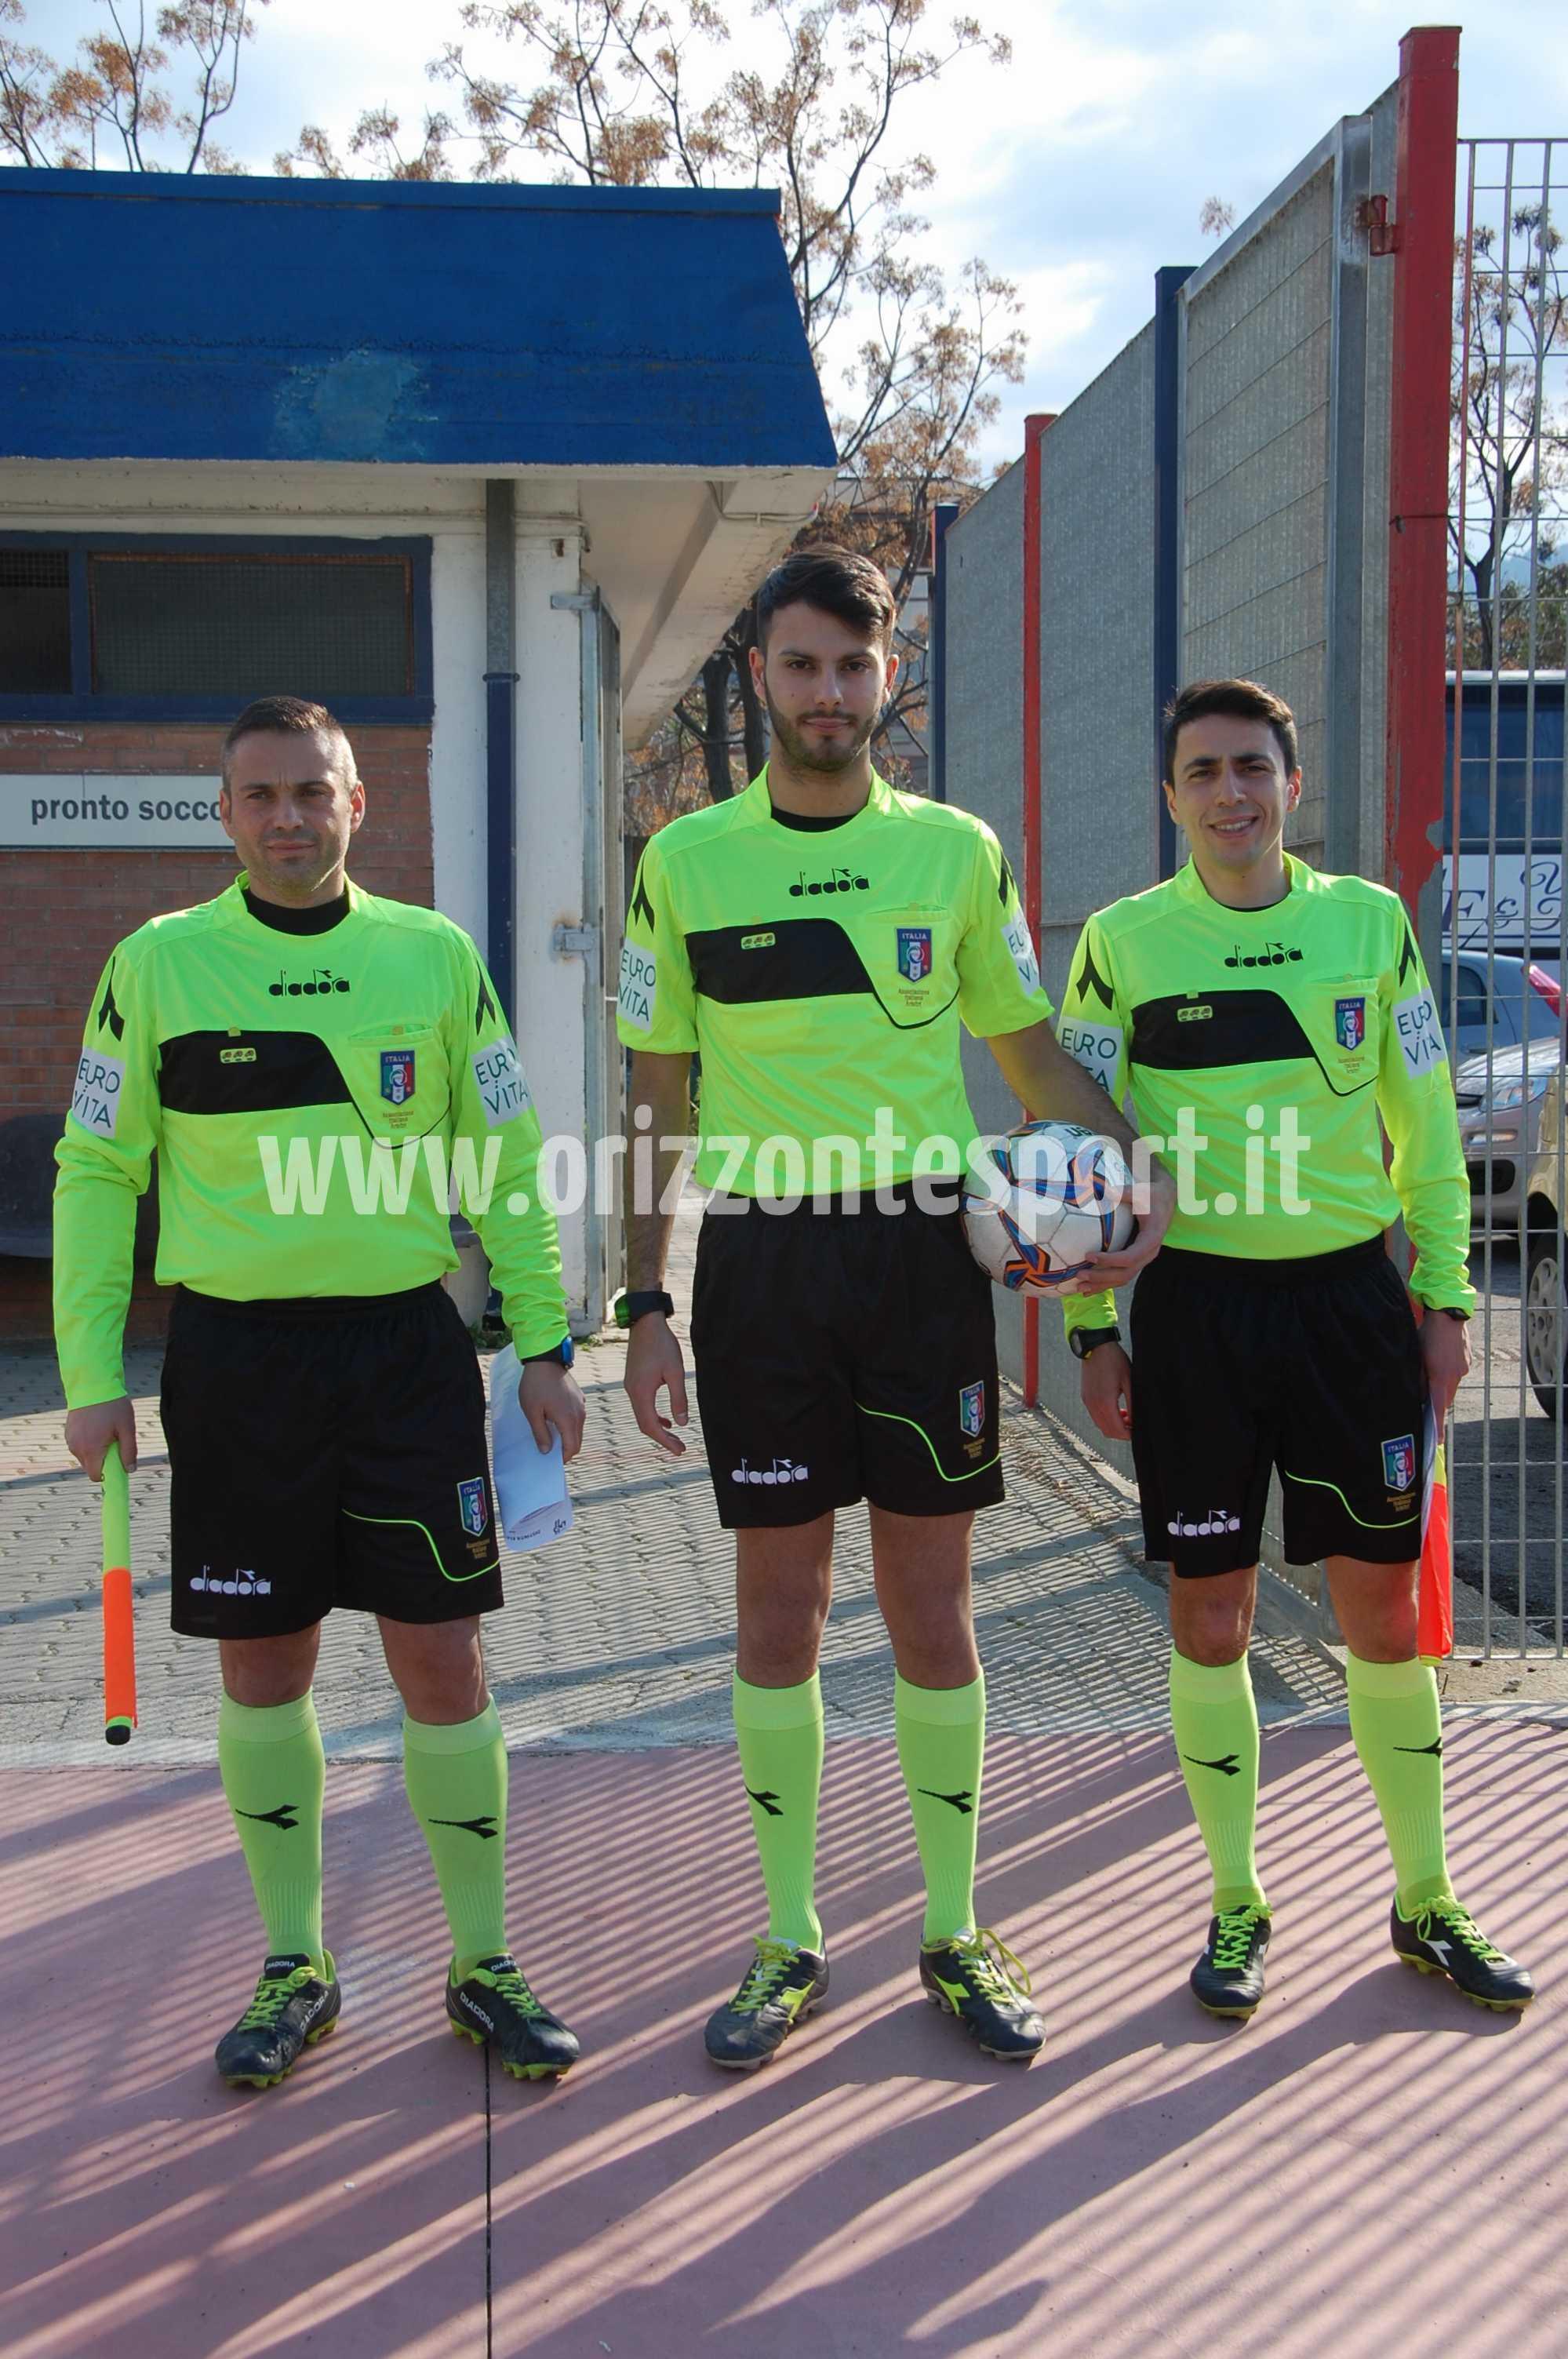 rossanese_belvedere (3)